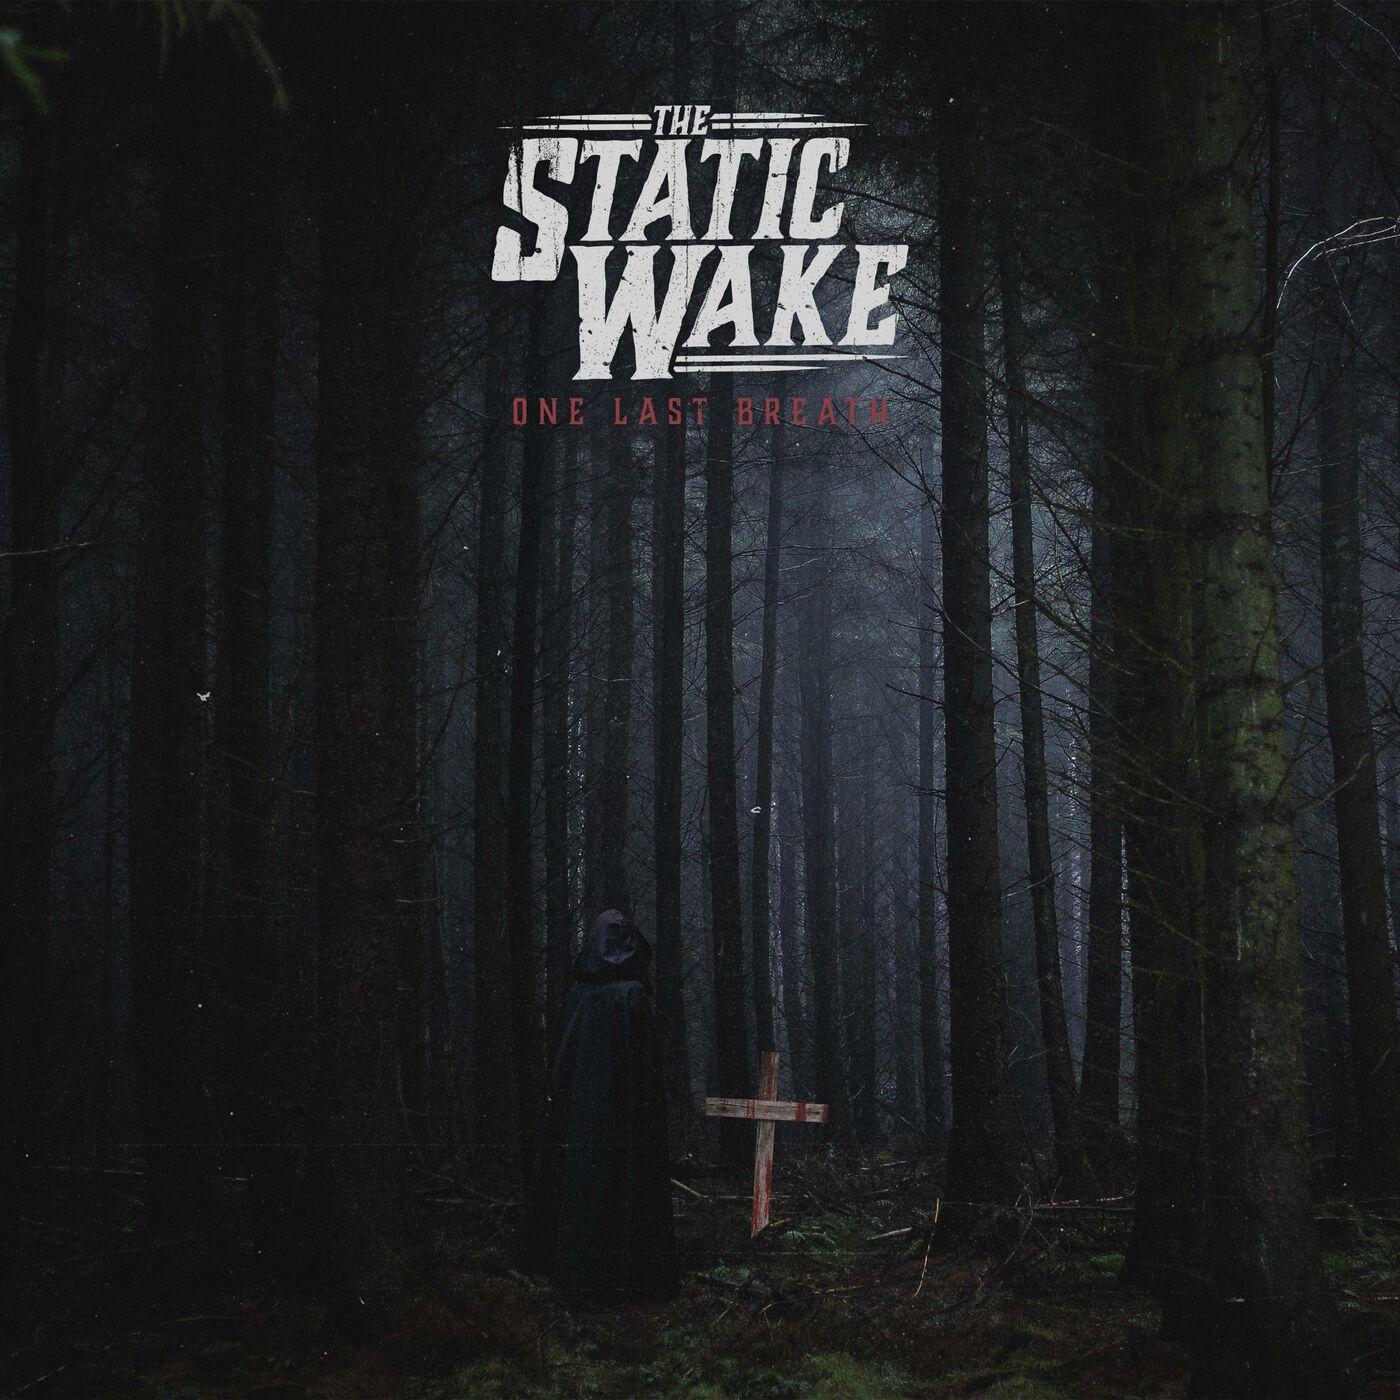 The Static Wake - One Last Breath [EP] (2020)